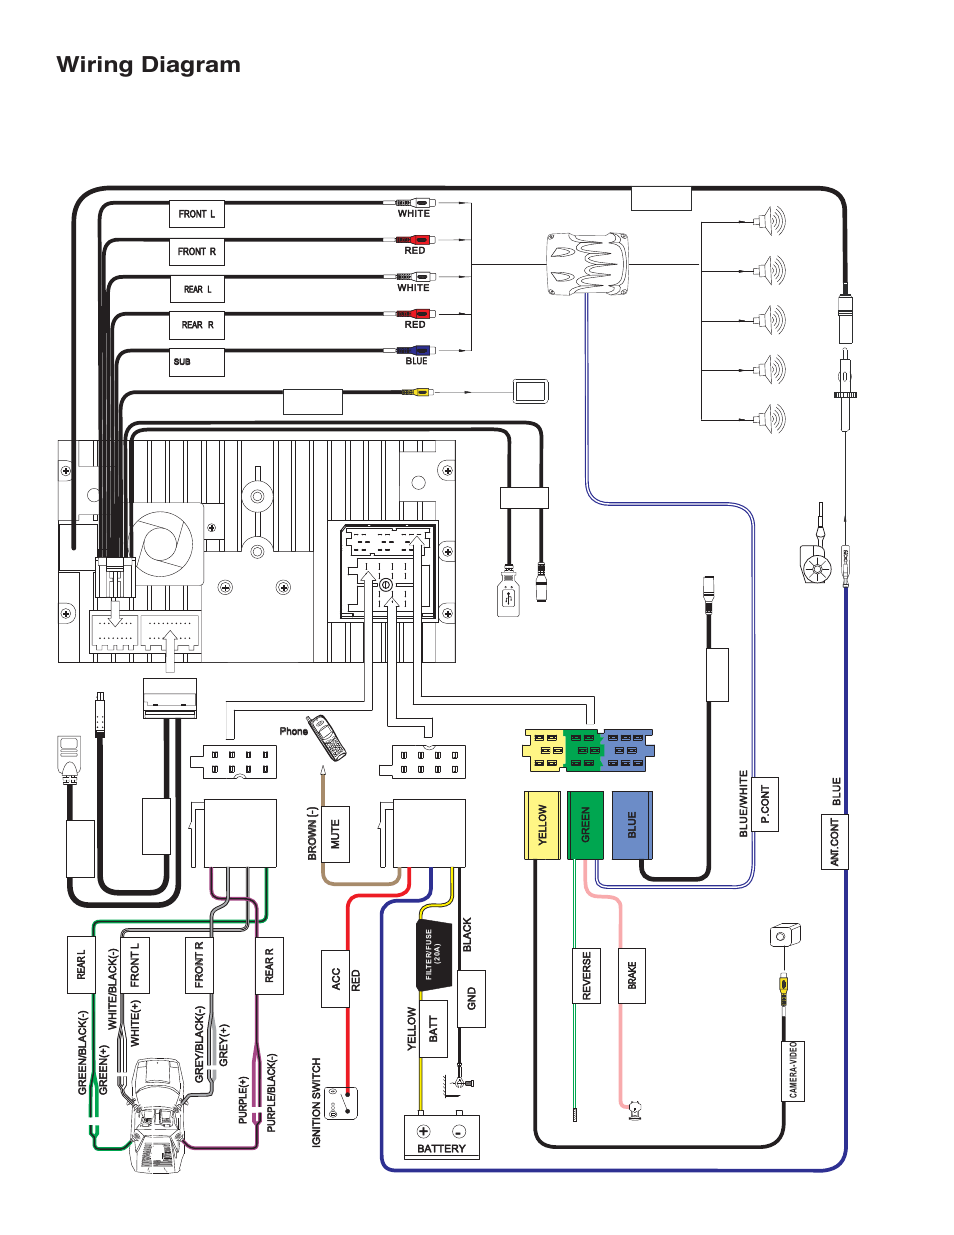 jr 50 carburetor diagram, viper remote start diagram, rascal quad parts diagram, peerless transmission parts diagram, rascal scooter parts diagram, eton viper parts diagram, viper mini 50 wiring diagram, eton viper mini 50, eton viper exhaust pipe, eton viper jr parts, eton 90 atv parts, eton 90r parts diagram, eton viper jr 40cc, eton atv parts diagram, viper winch wiring diagram, eton 90 parts diagram, viper remote starter wiring diagram, eton 90r wiring-diagram, viper alarm system wiring diagram, eton viper diqagram wiring, on eton viper 90 wiring diagram